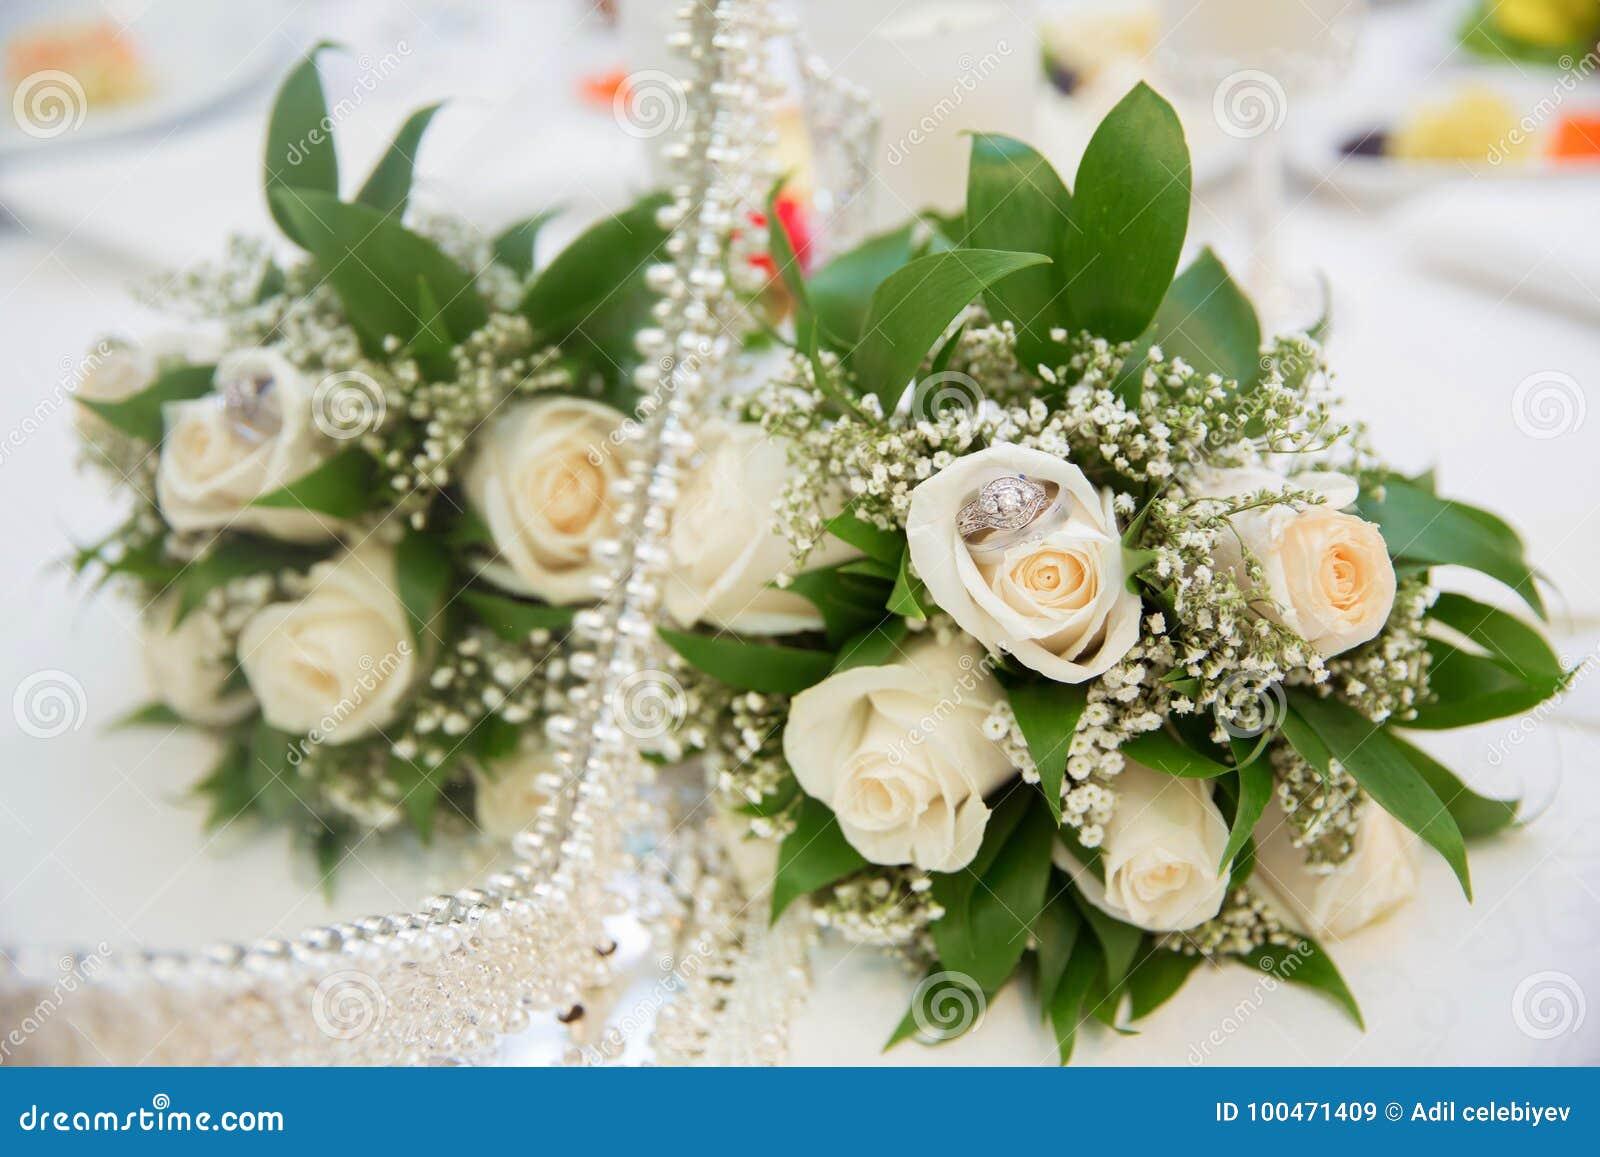 c24f52eb0b5a Οι όμορφες άσπρες γαμήλιες ανθοδέσμες στα λουλούδια ανθοδεσμών καλαθιών  backgraound αυξήθηκαν